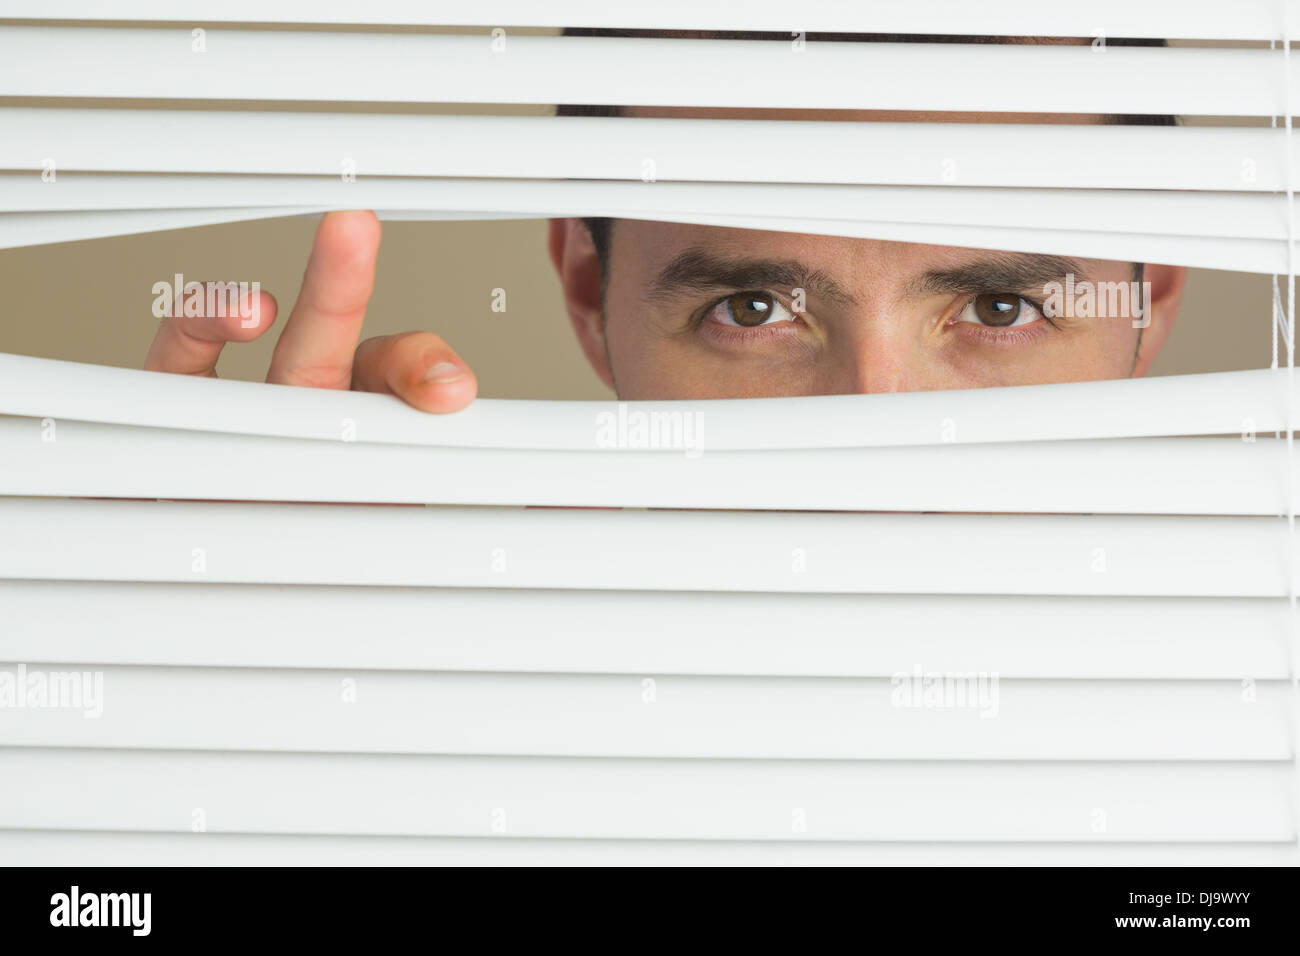 Focused male eyes spying through roller blind - Stock Image